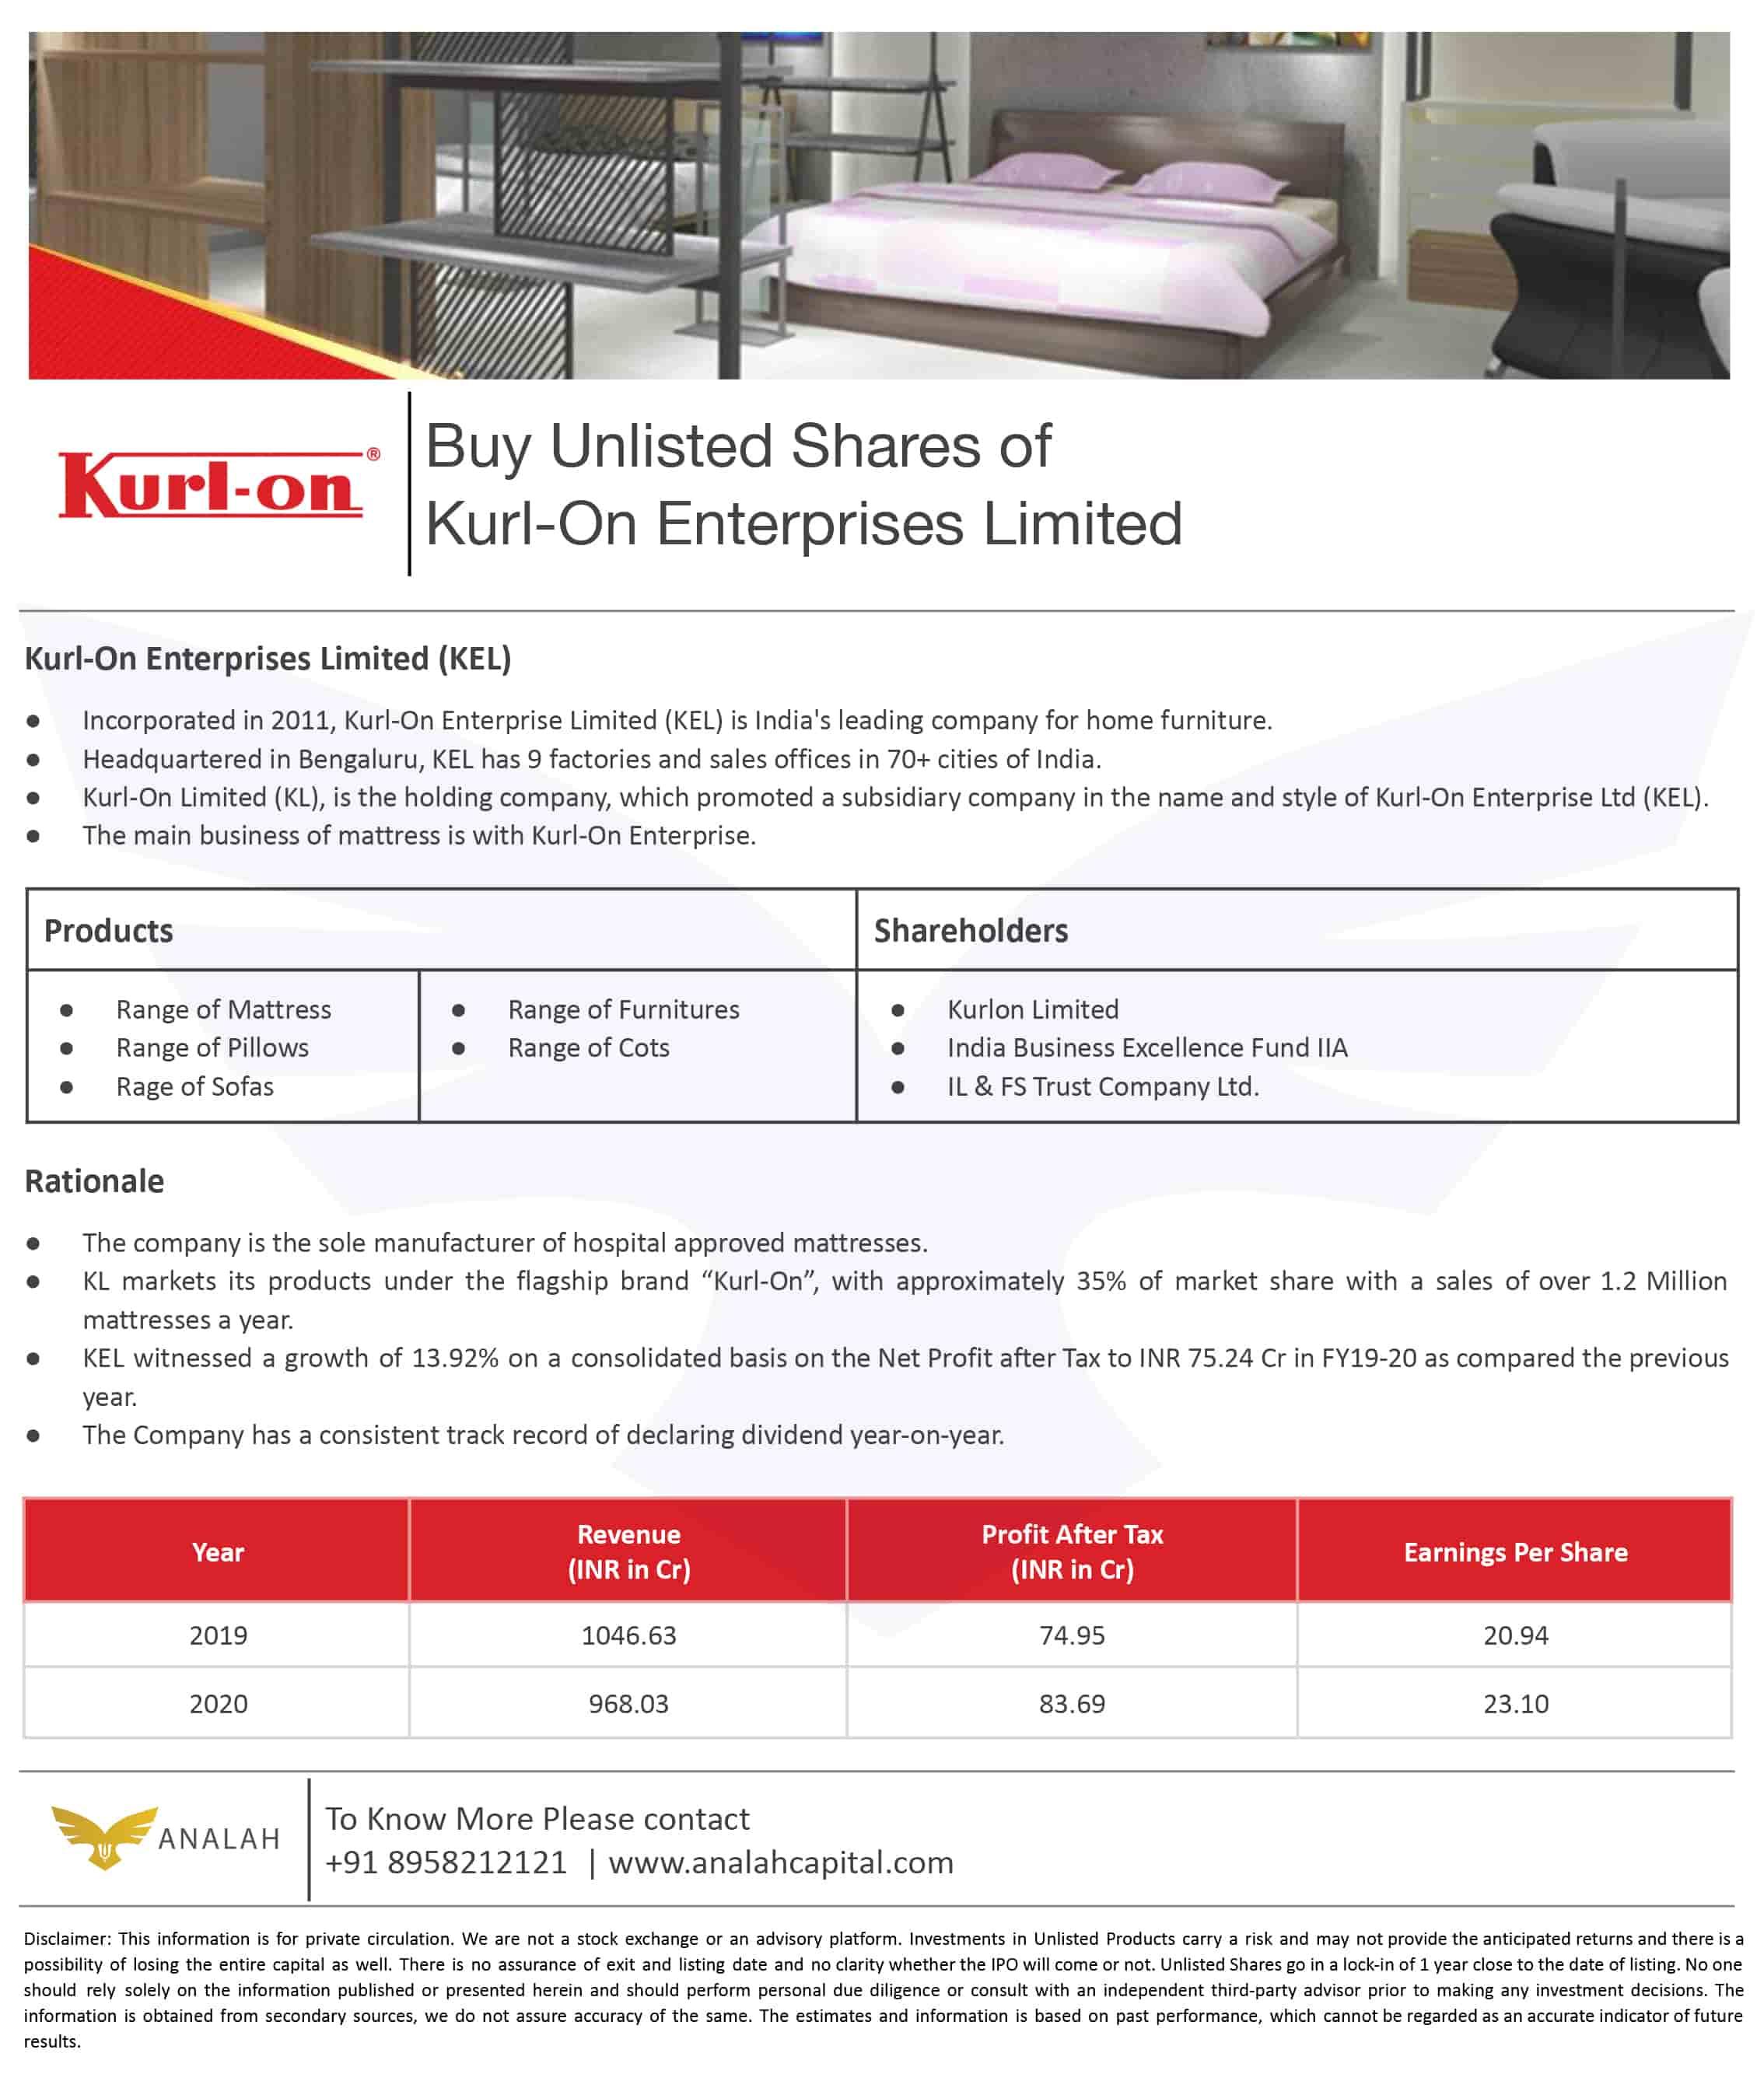 Kurl-On Enterprises Unlisted Shares